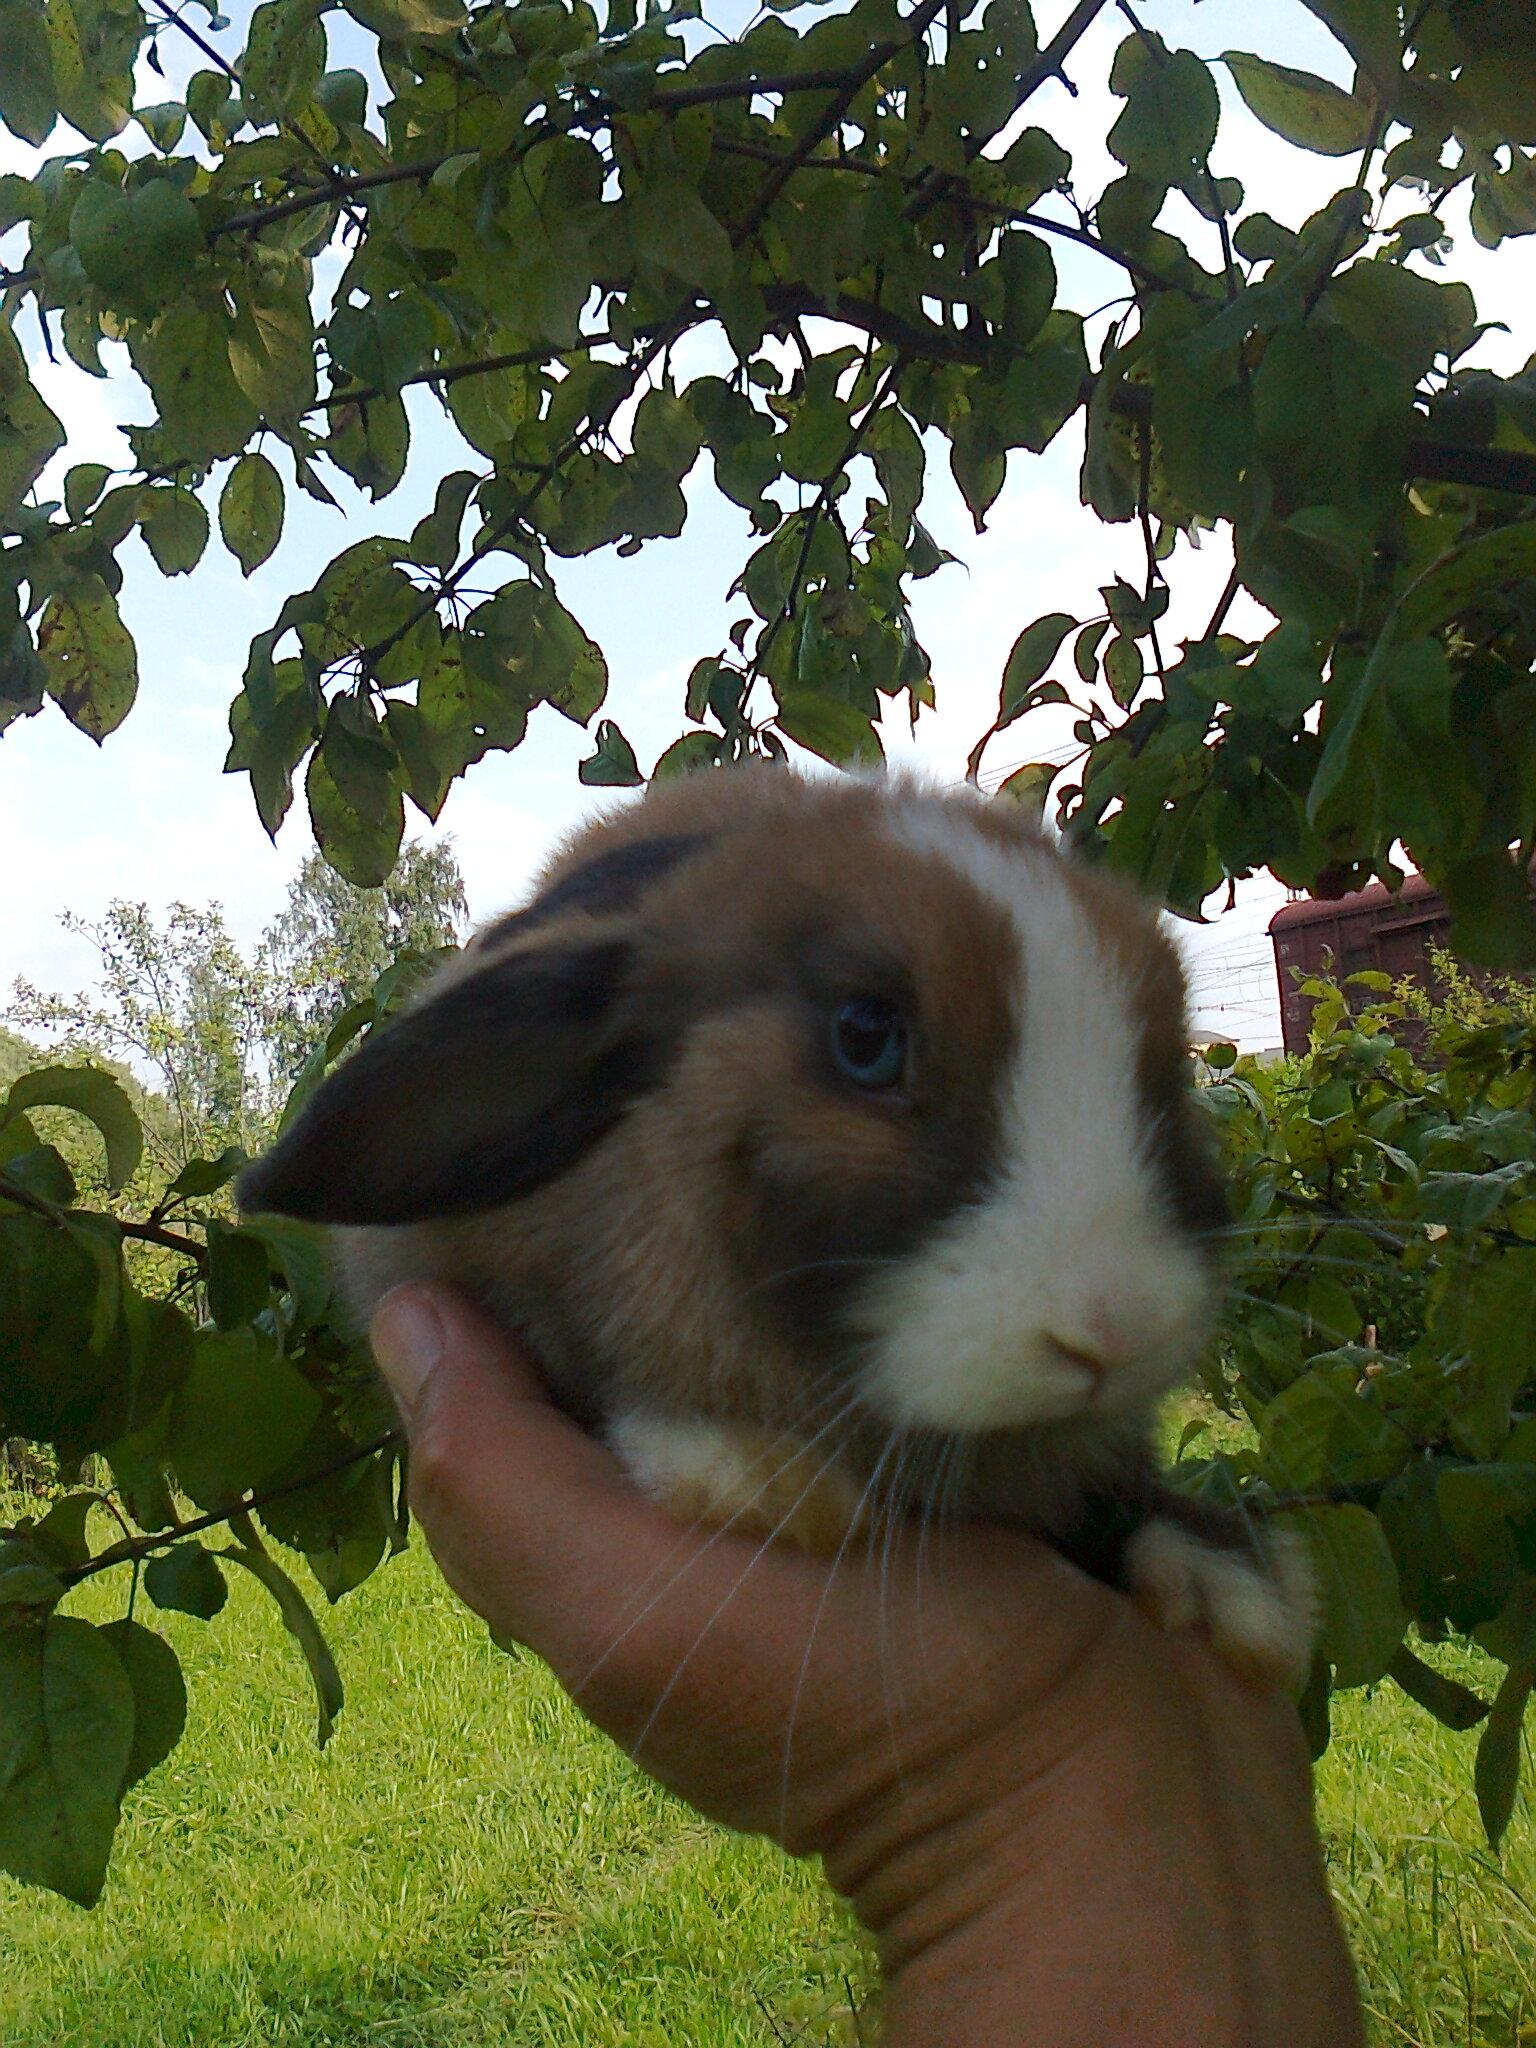 a dwarf rabbit. shipping. Johnny